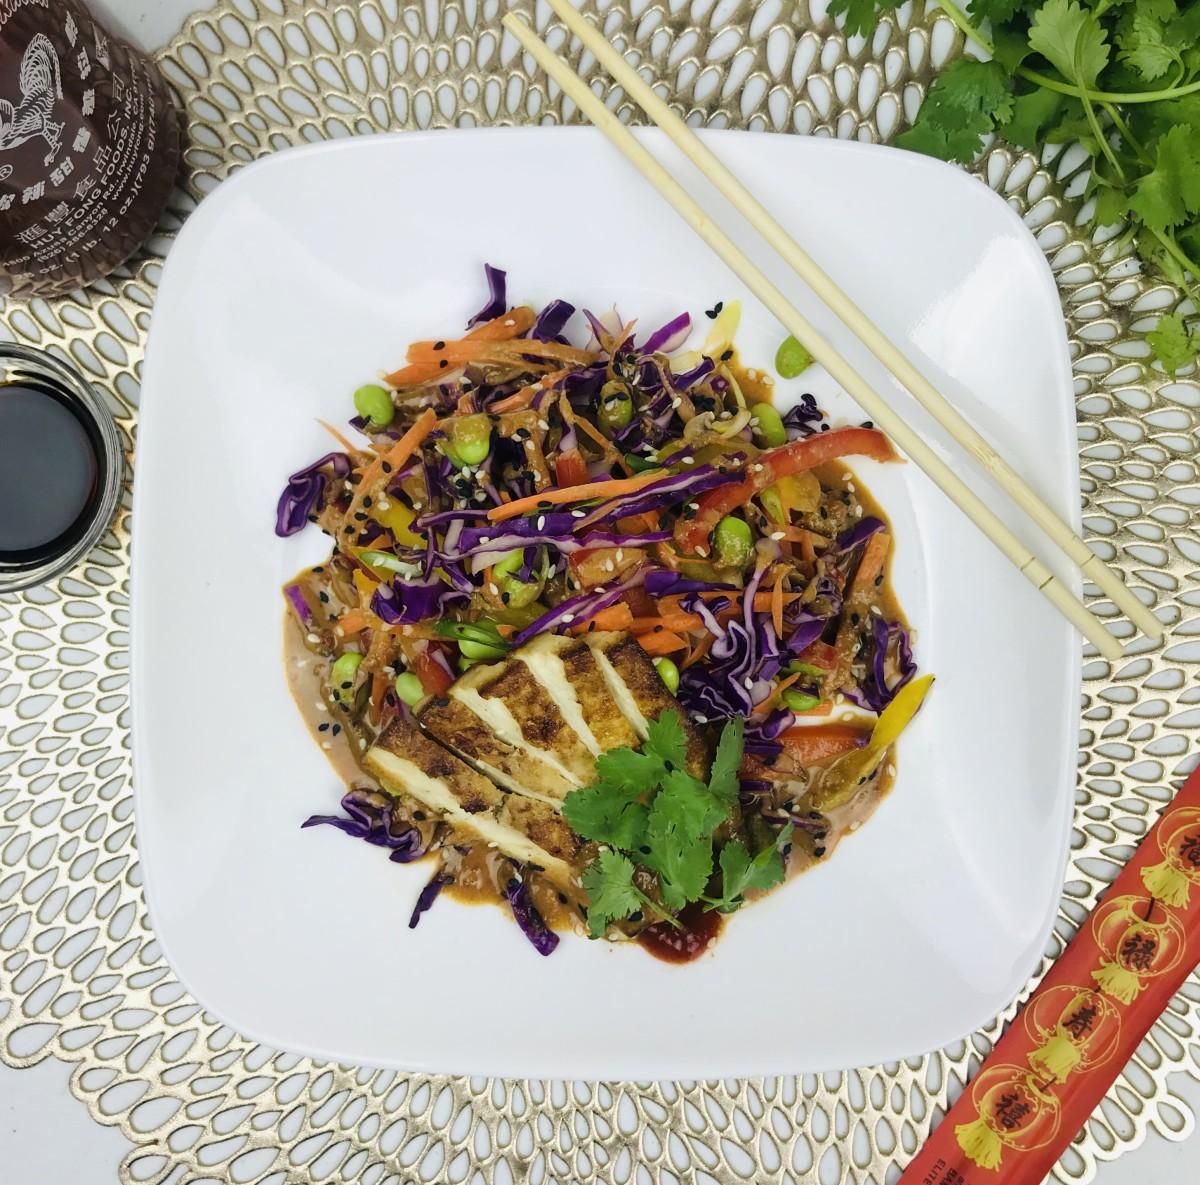 Rainbow Salad With a Spicy Peanut Dressing (Vegan, Gluten-Free)